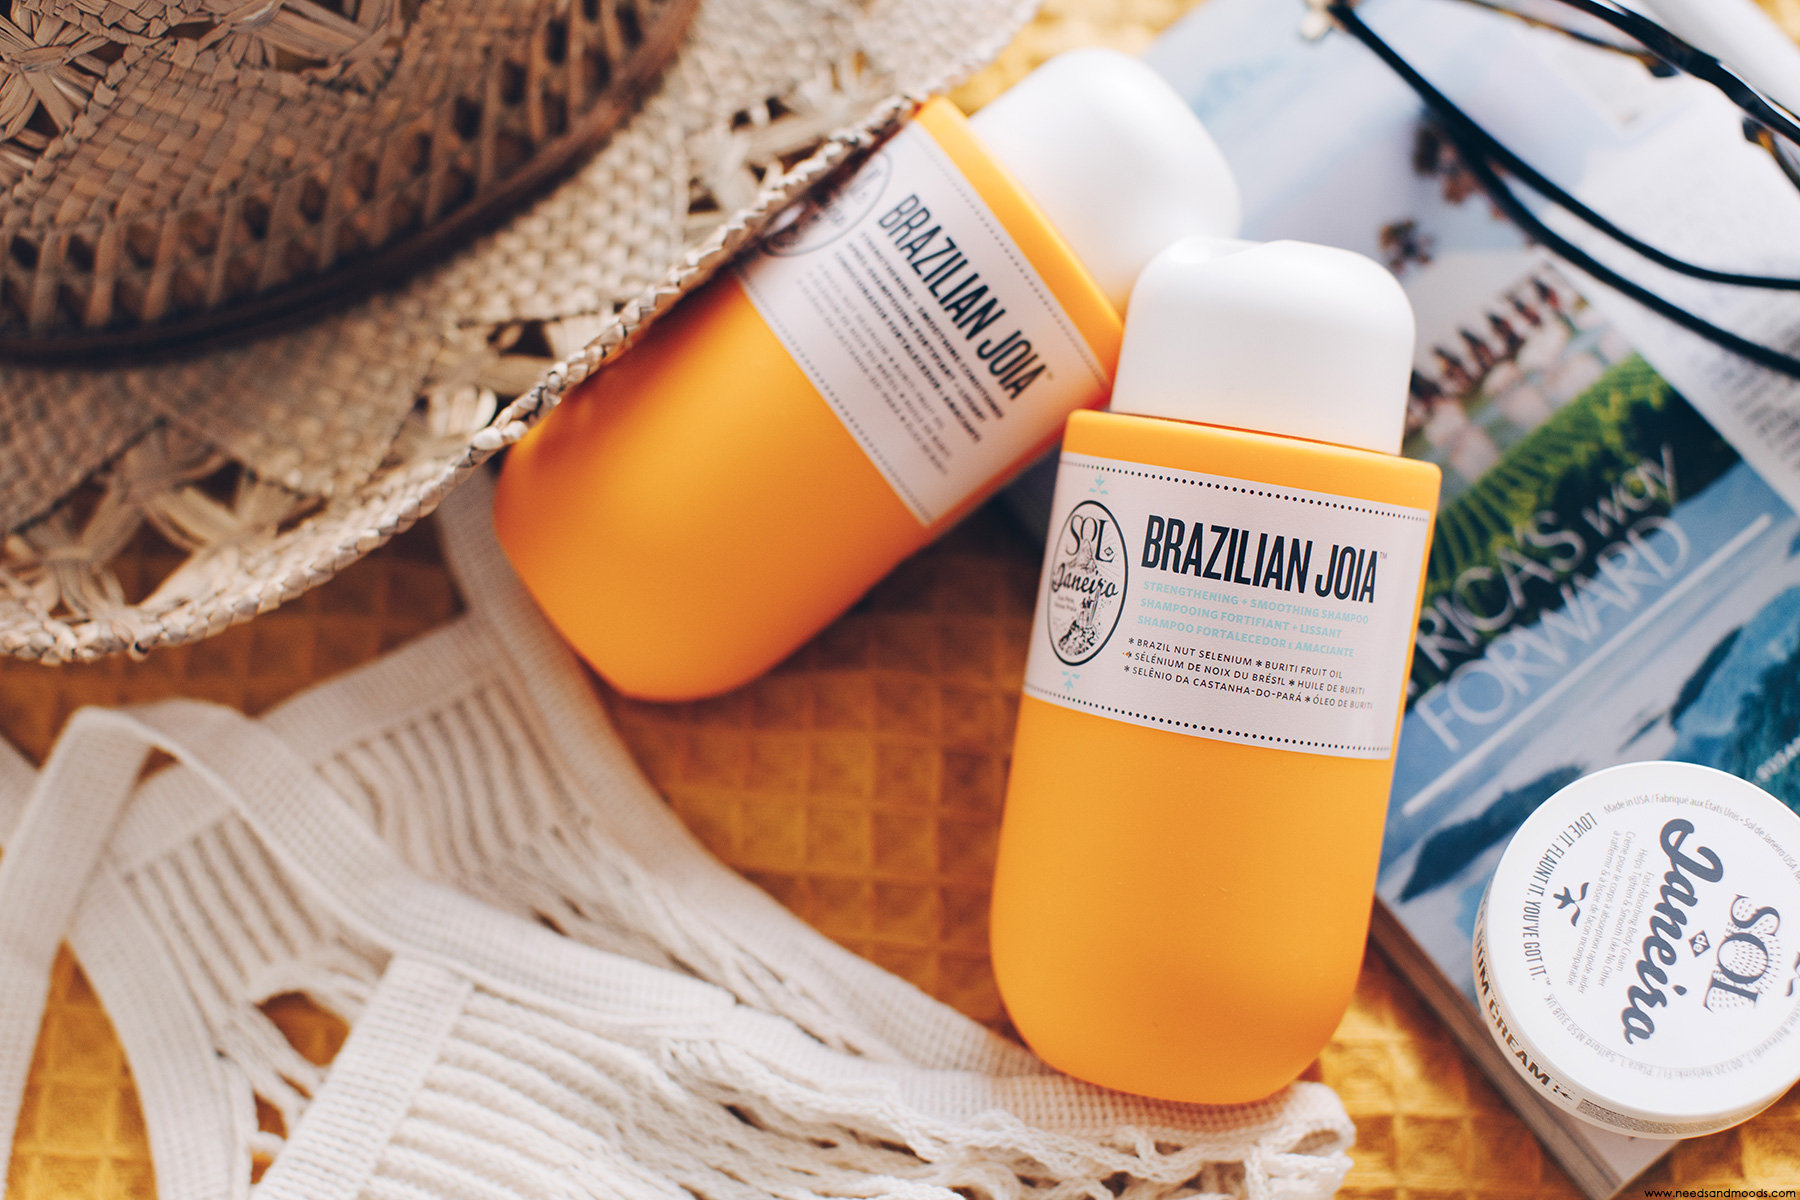 sol de janeiro brazilian joia avis shampoo conditioner